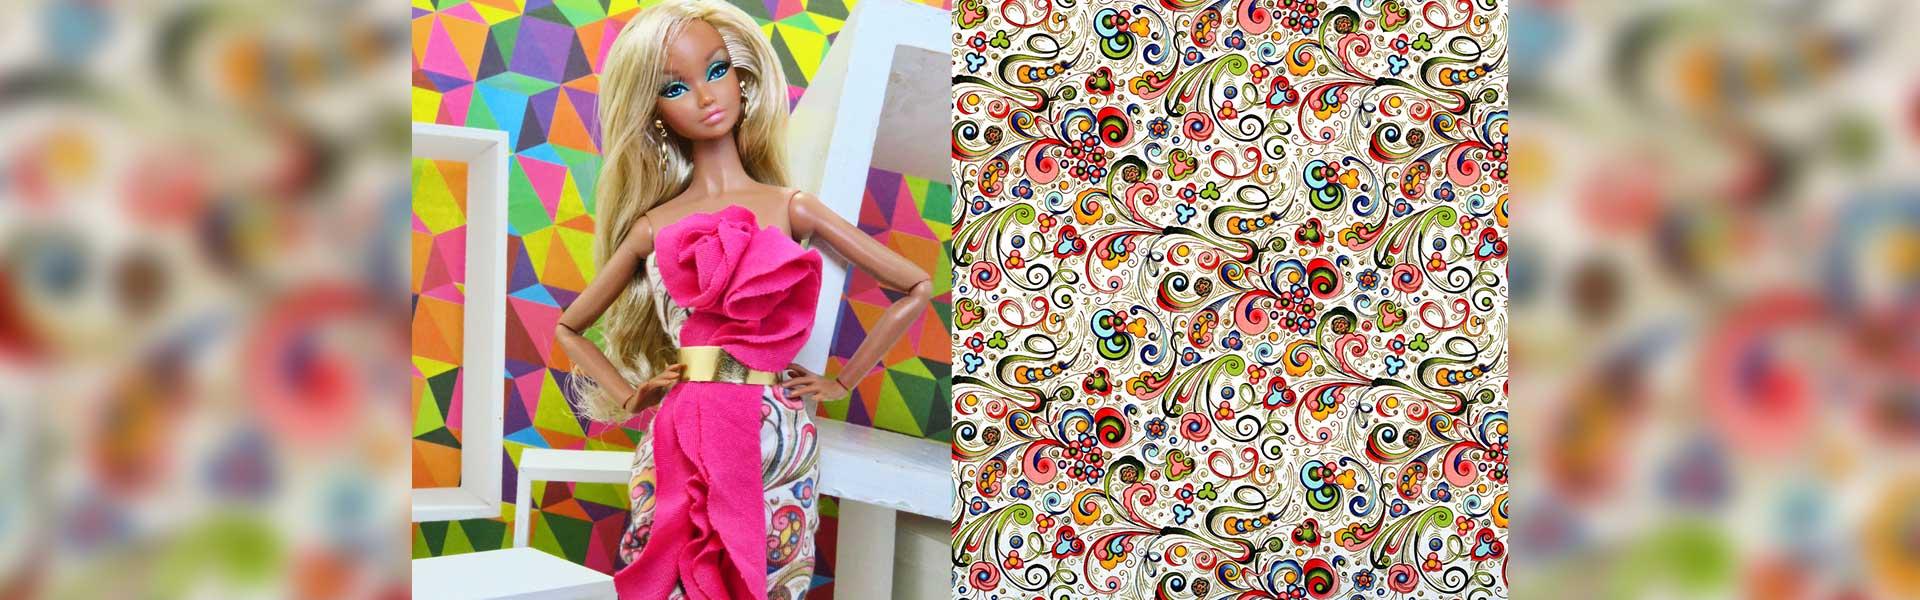 doll-fashions-rossi1931-crt117